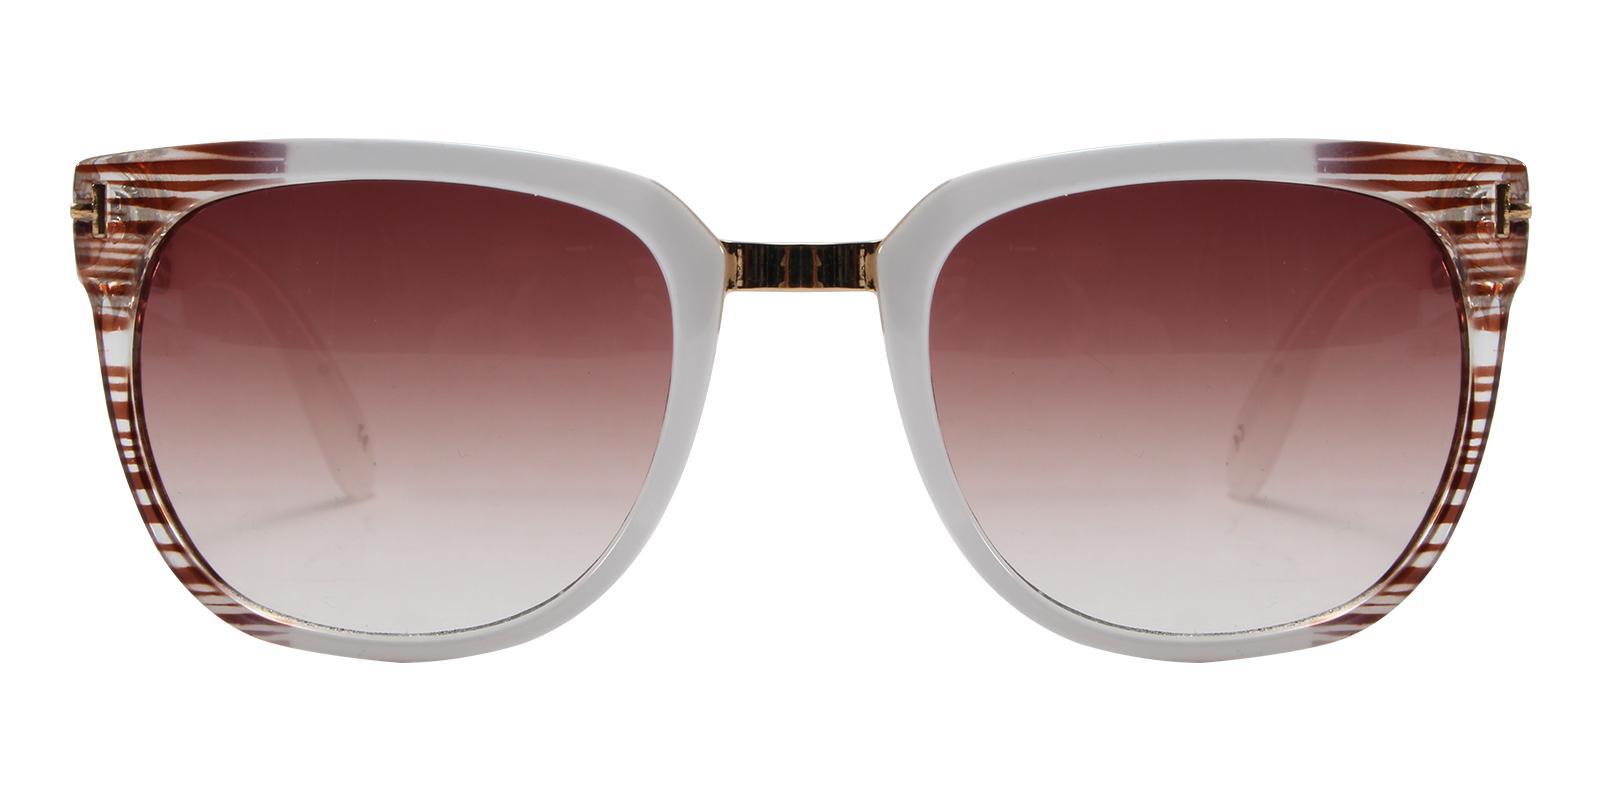 Mars Striped Acetate Sunglasses , UniversalBridgeFit Frames from ABBE Glasses